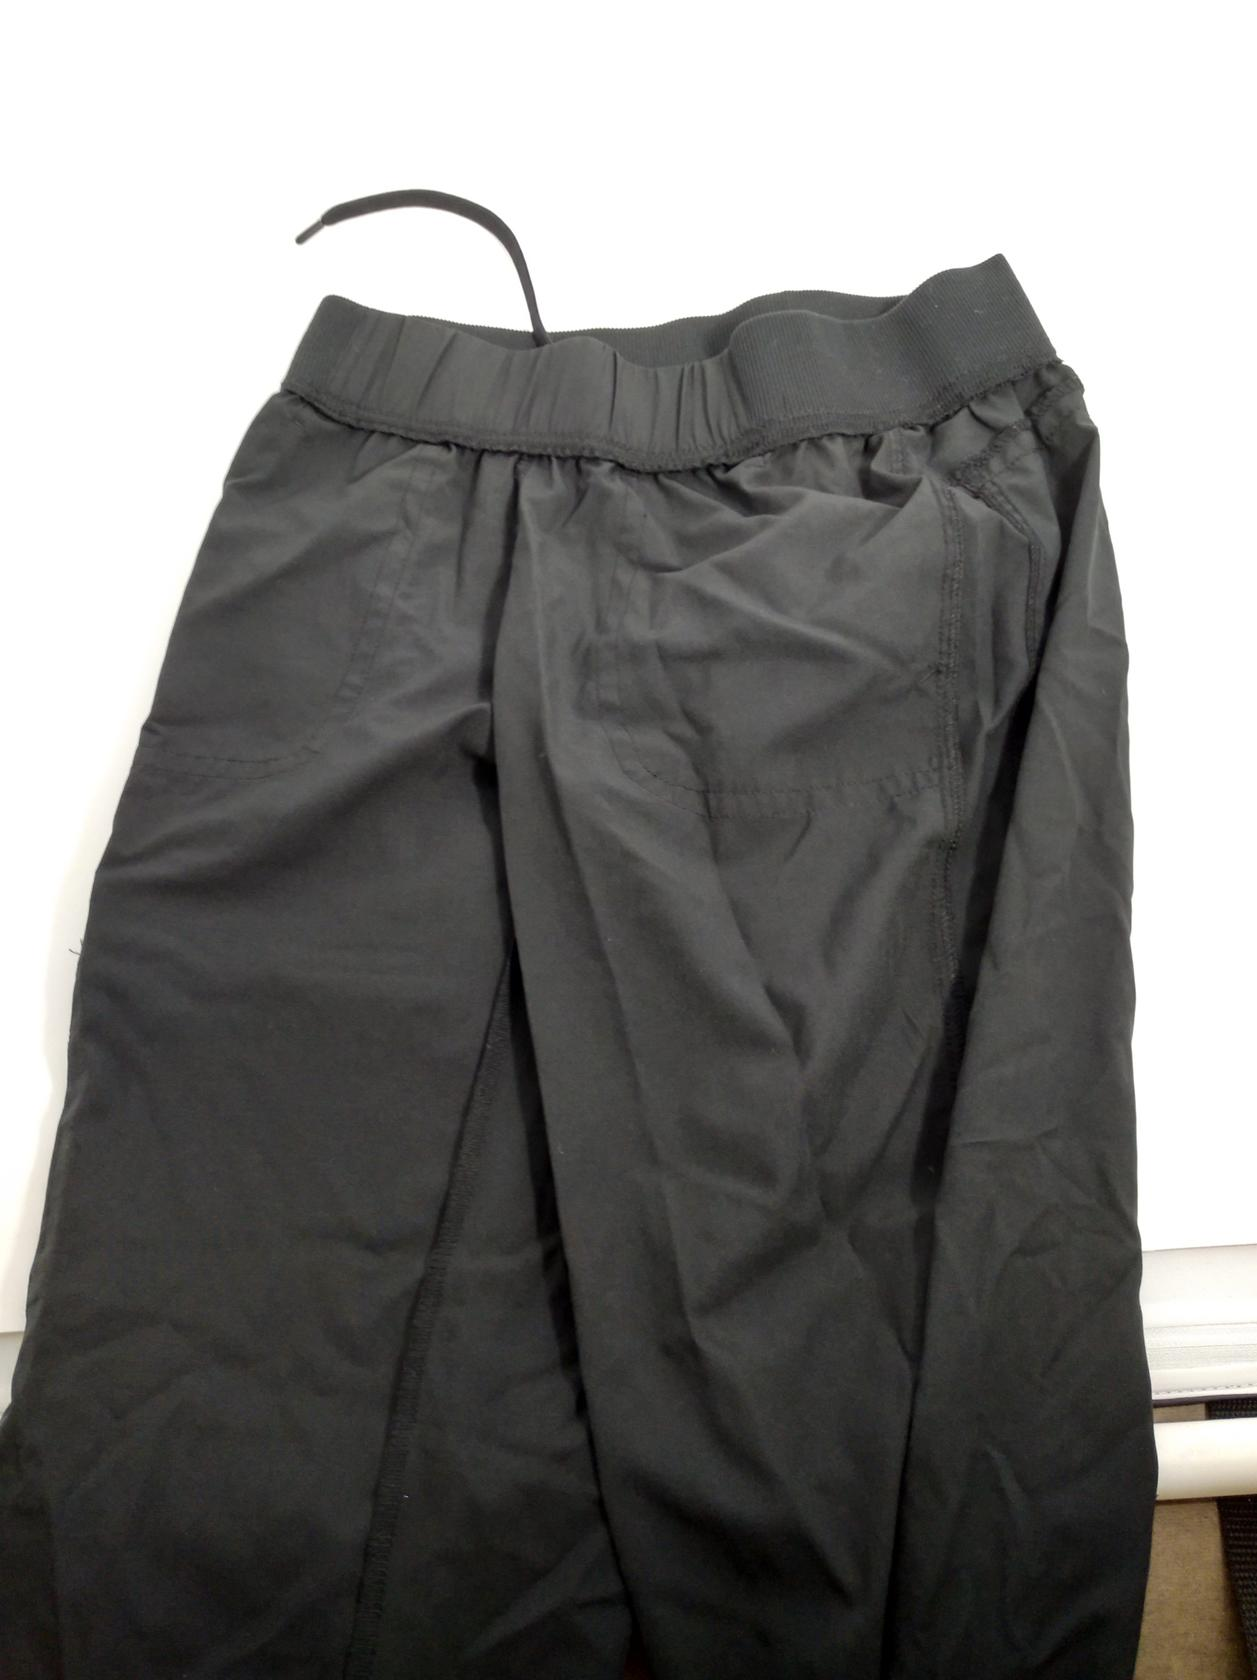 C9 Champion Womens Woven Training Pants